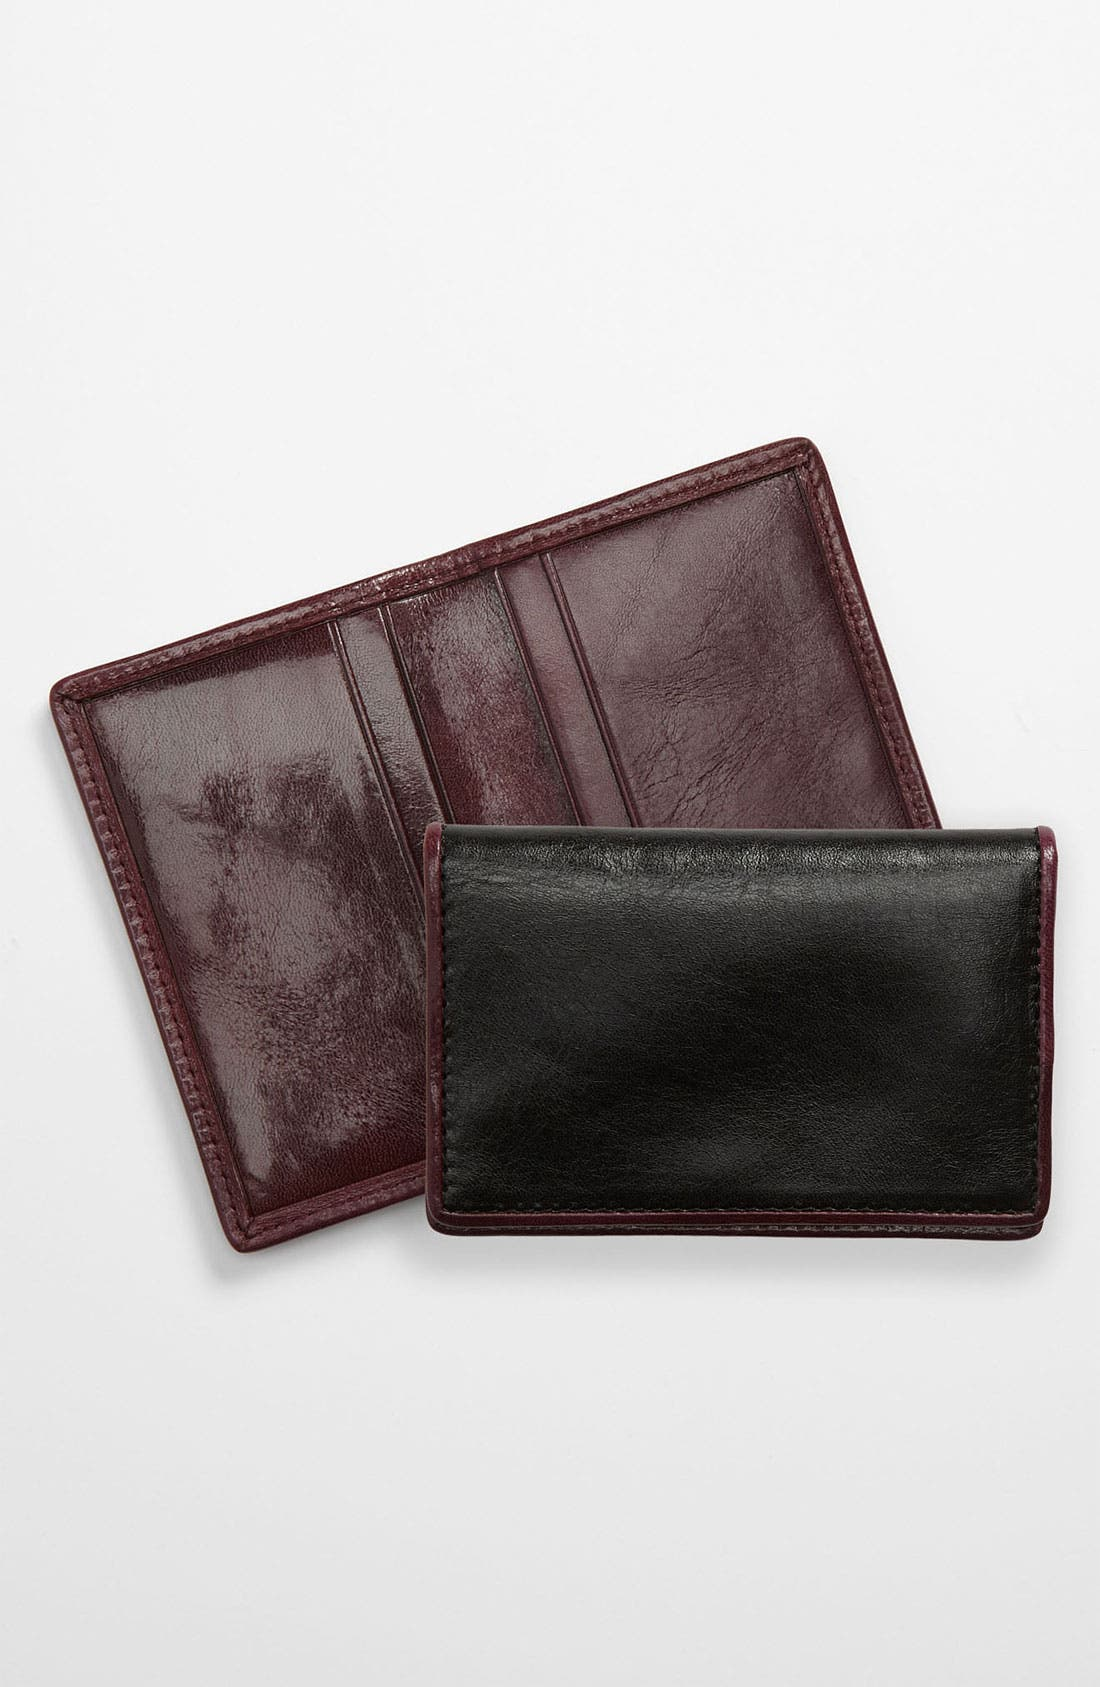 Main Image - Bosca 'Small' Card Case